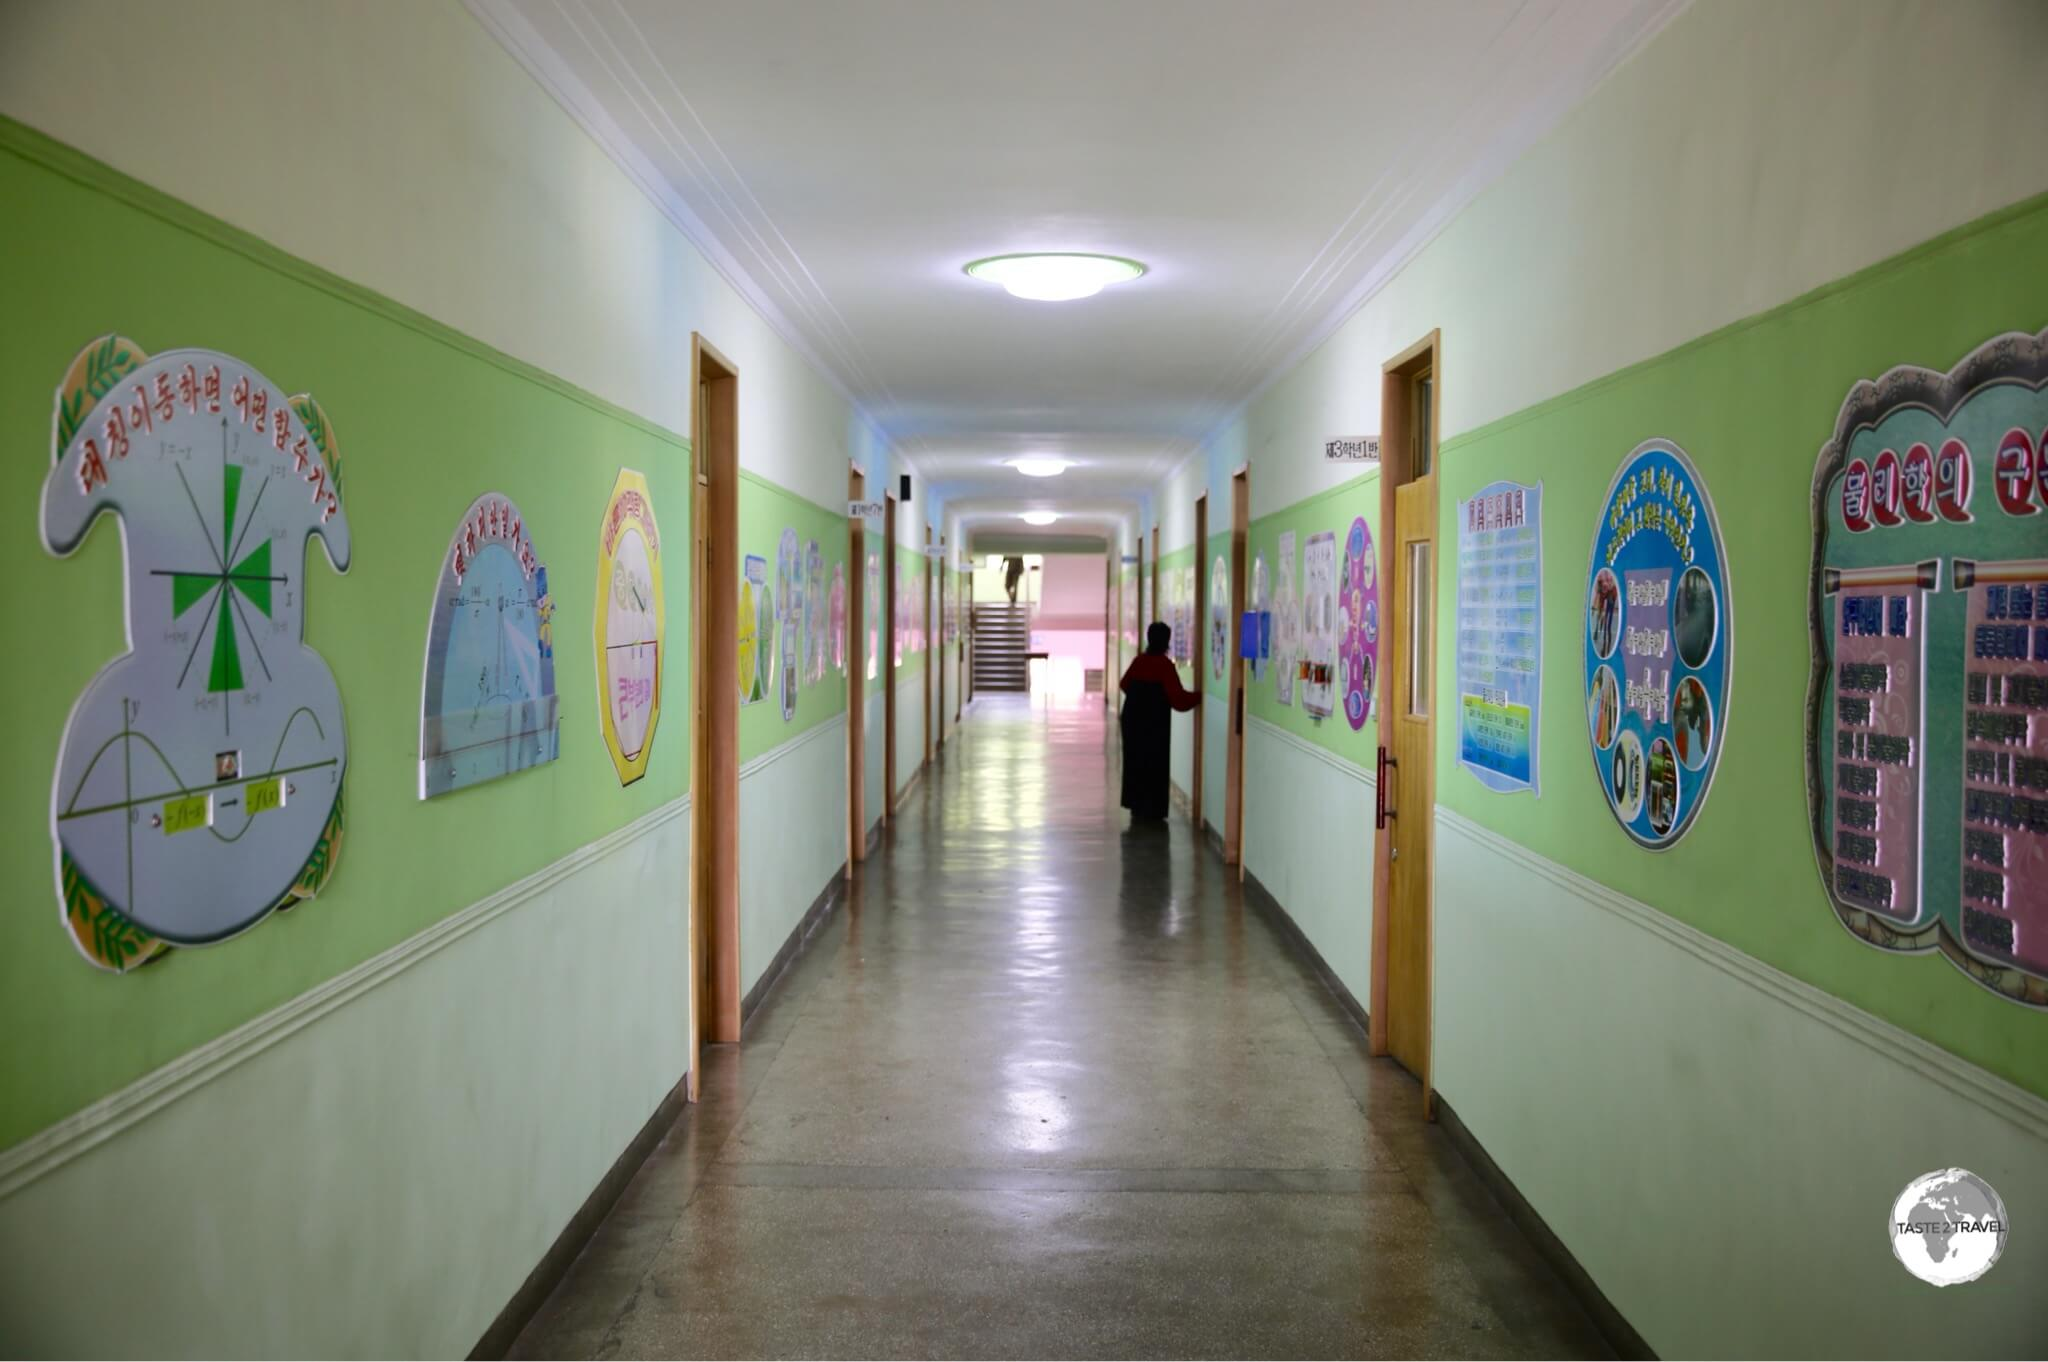 Then spotlessly clean corridor inside the model school.